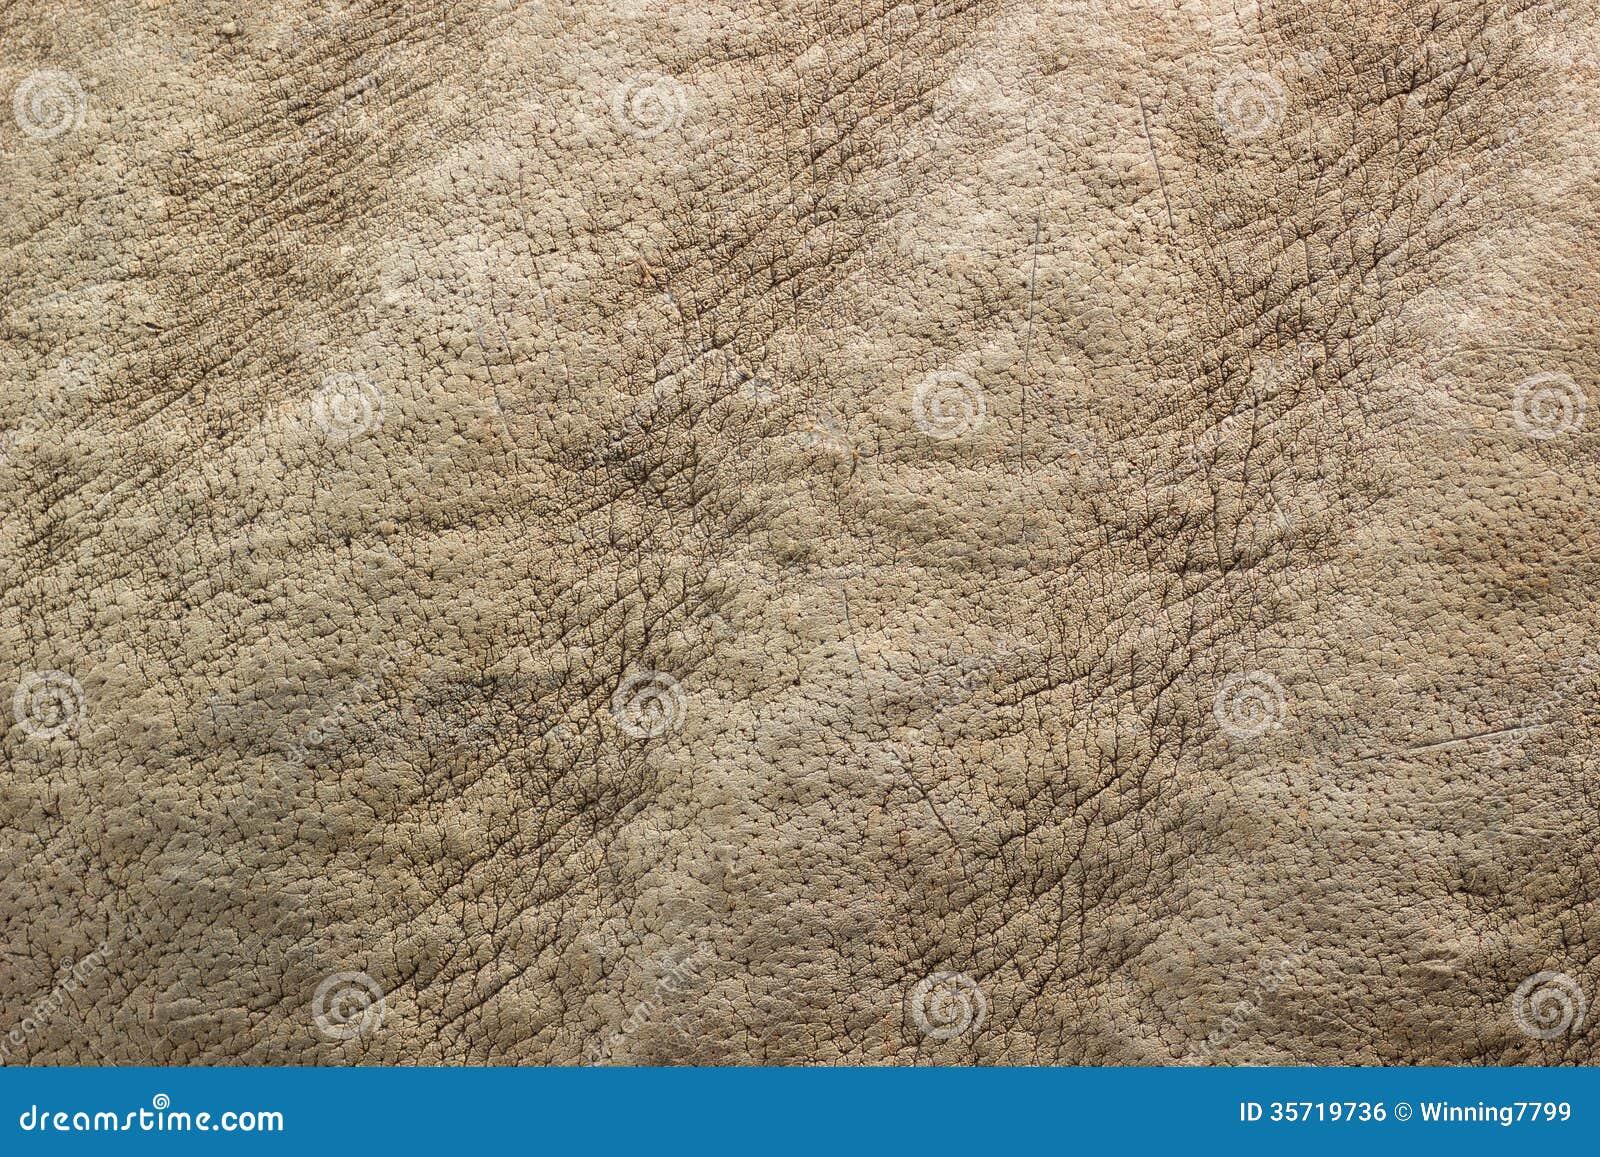 Rhino Skin Texture Royalty Free Stock Image - Image: 35719736